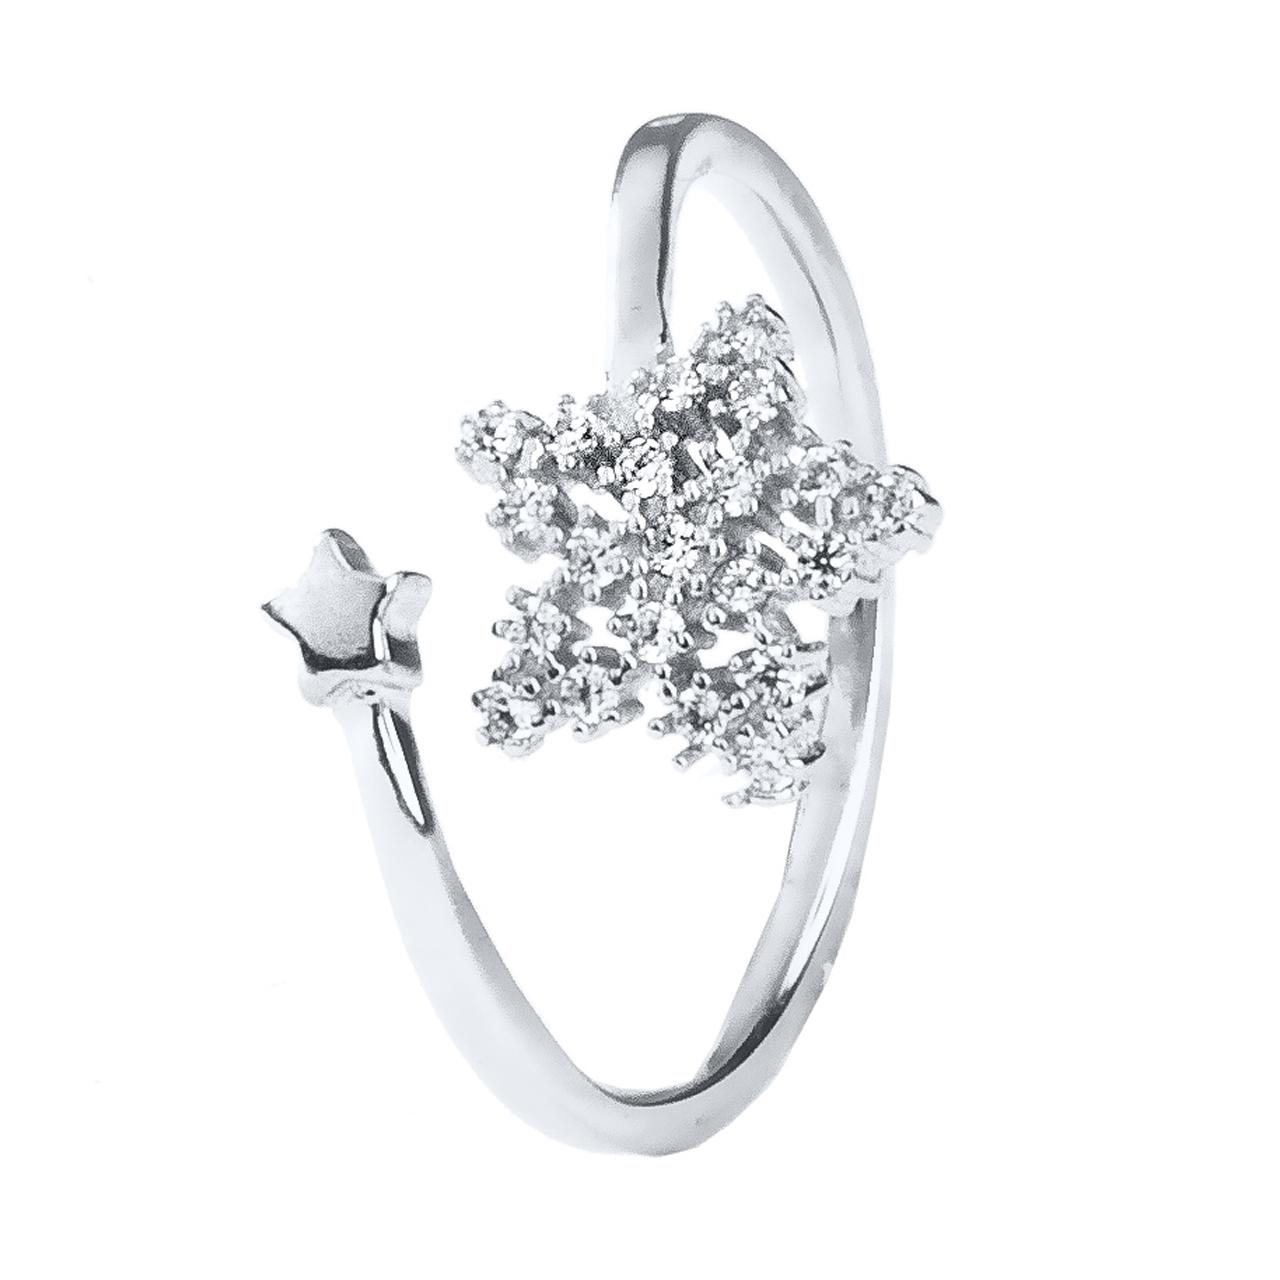 انگشتر نقره زنانه اقلیمه کد AN56